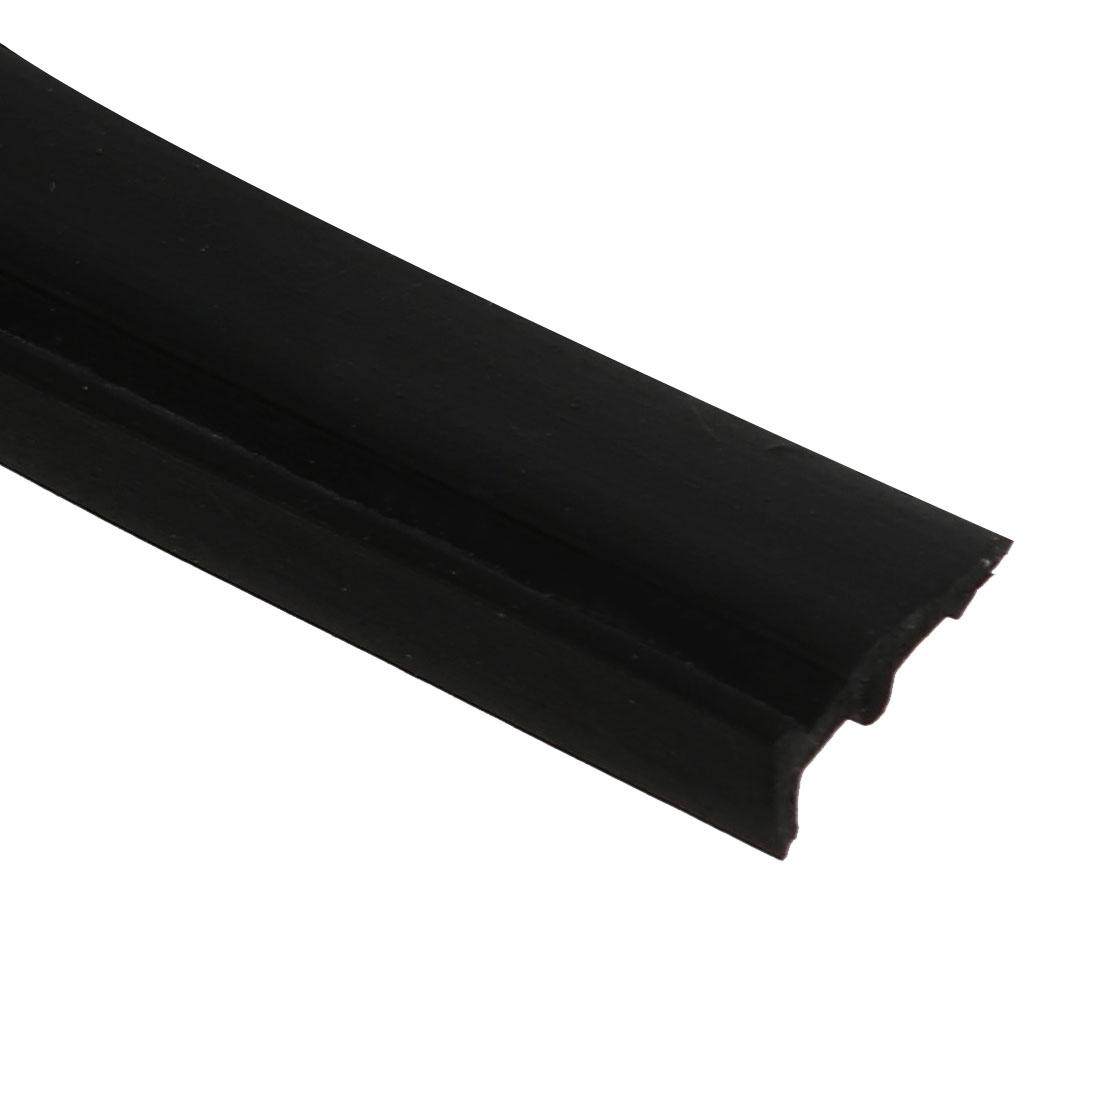 Unique Bargains 2M Length EPDM Rubber Single Side Weather Stripping Black for 2mm-3mm Gap - image 2 de 3